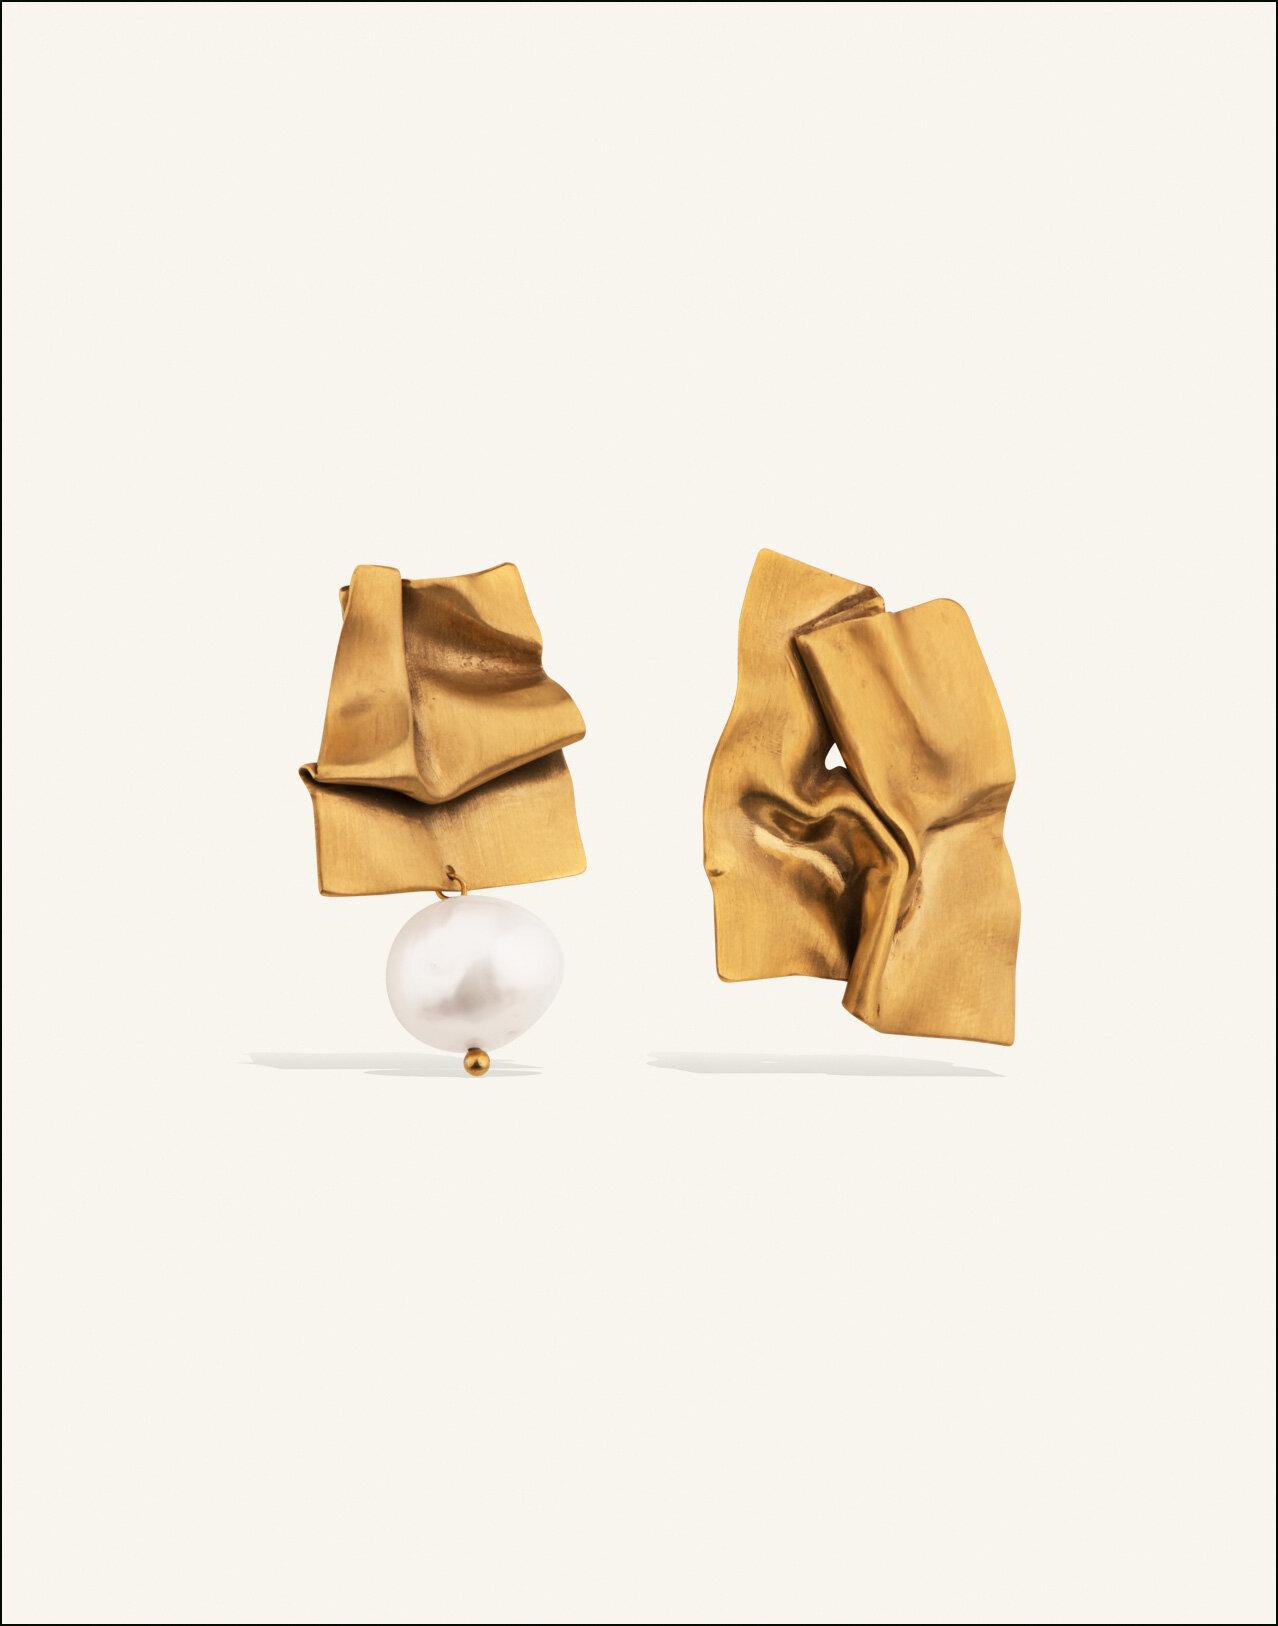 Completedworks-Gold-Vermeil-Earrings-Cohesion-2.jpg